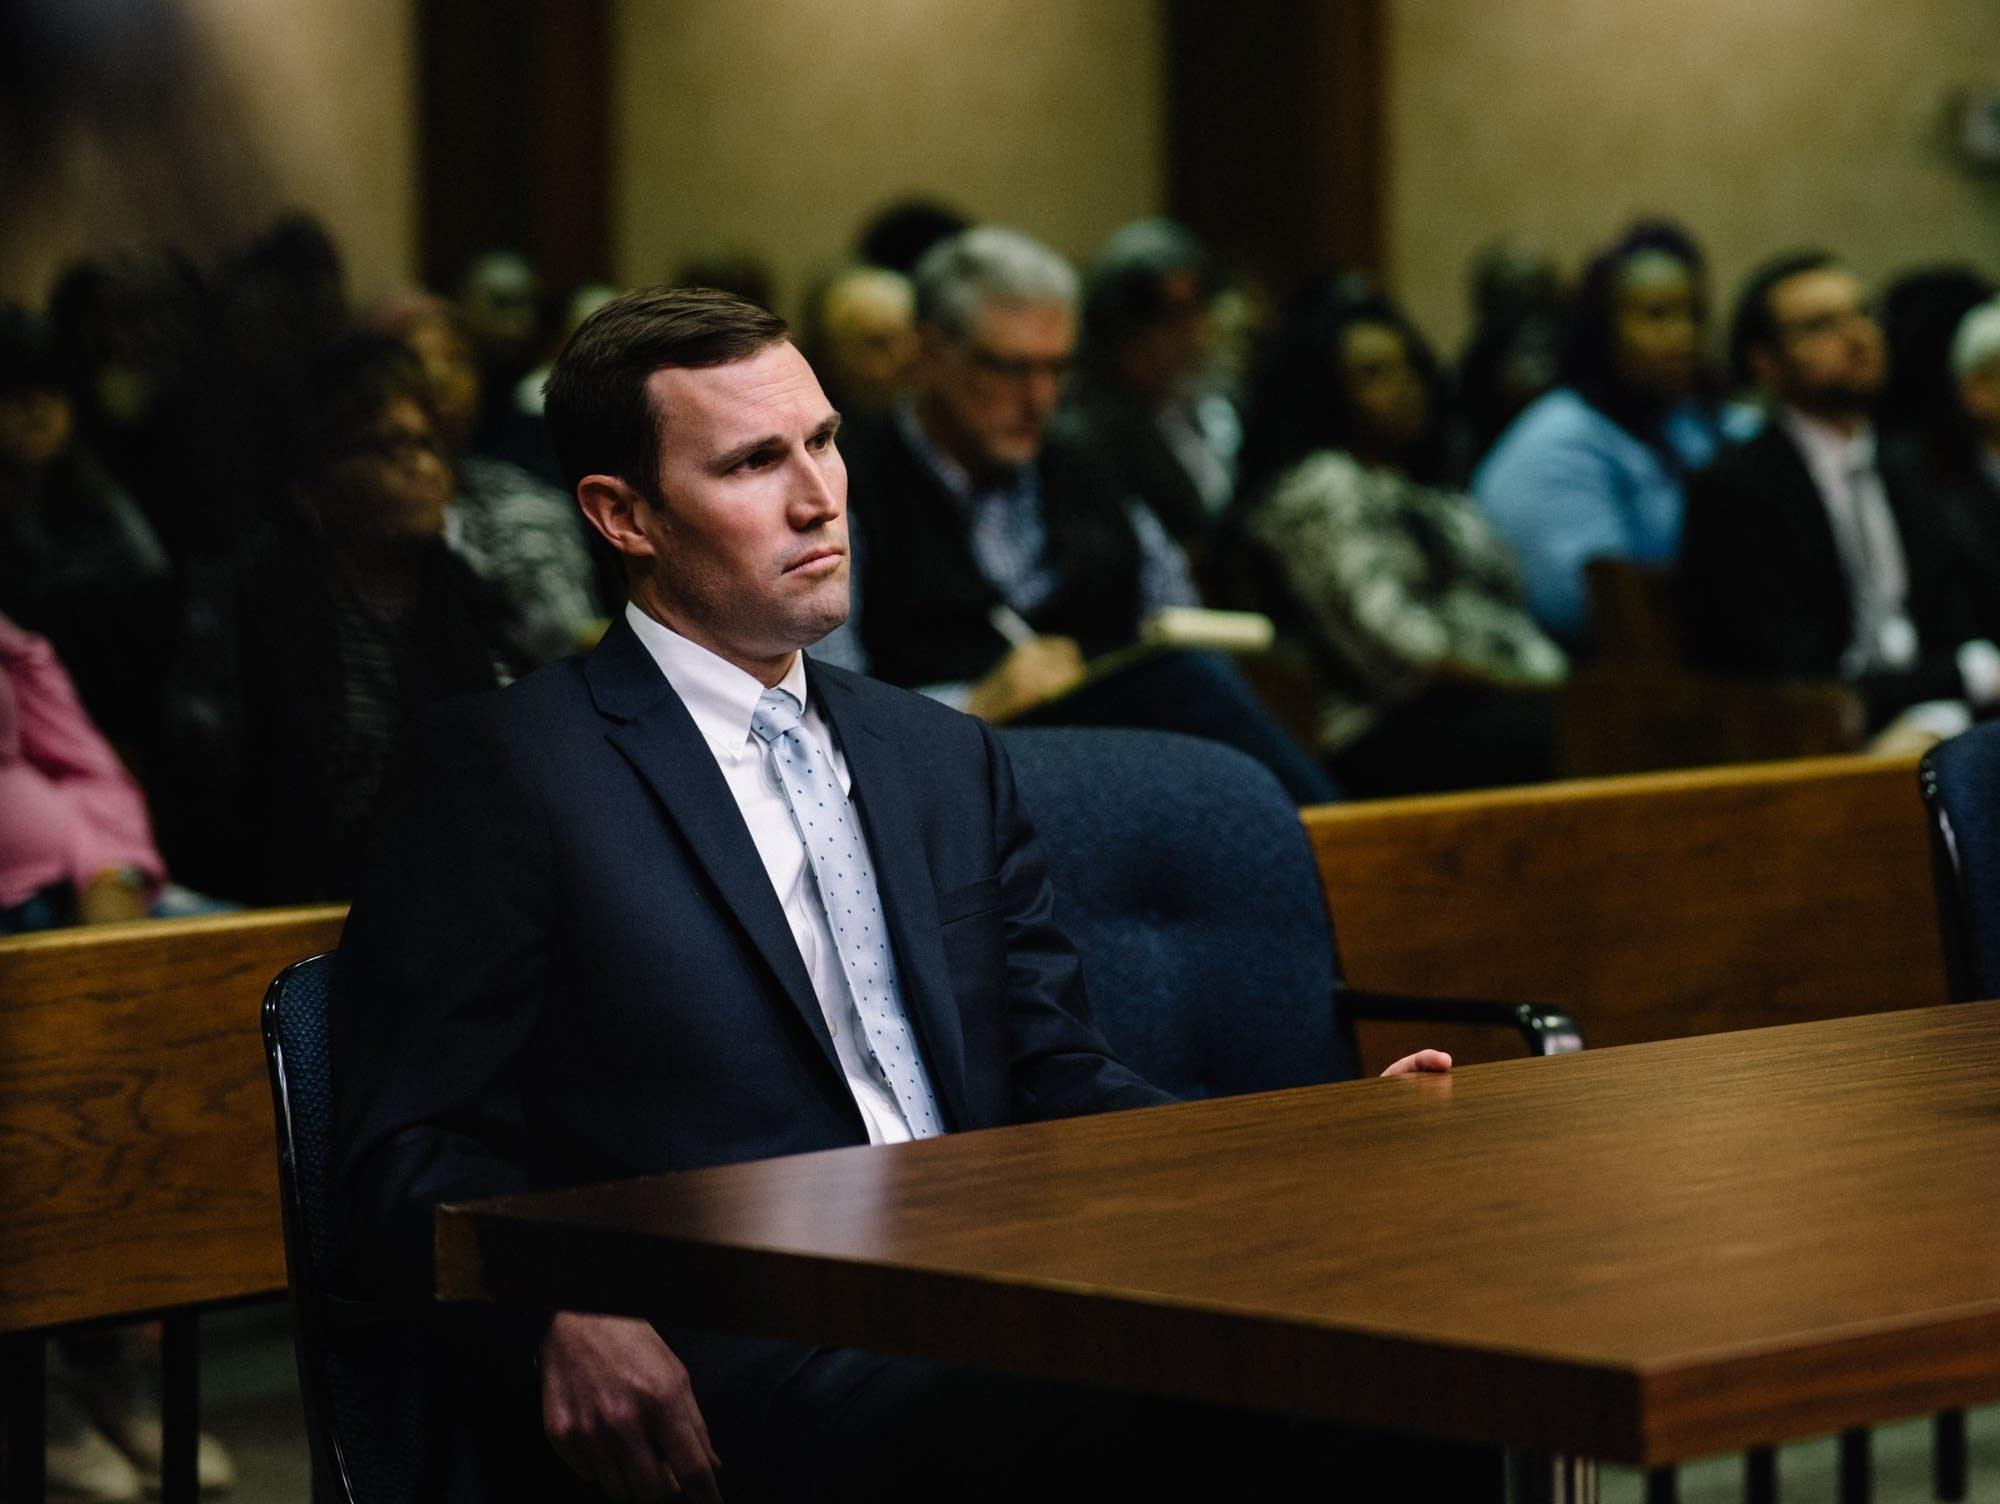 Assistant District Attorney Adam Hopper